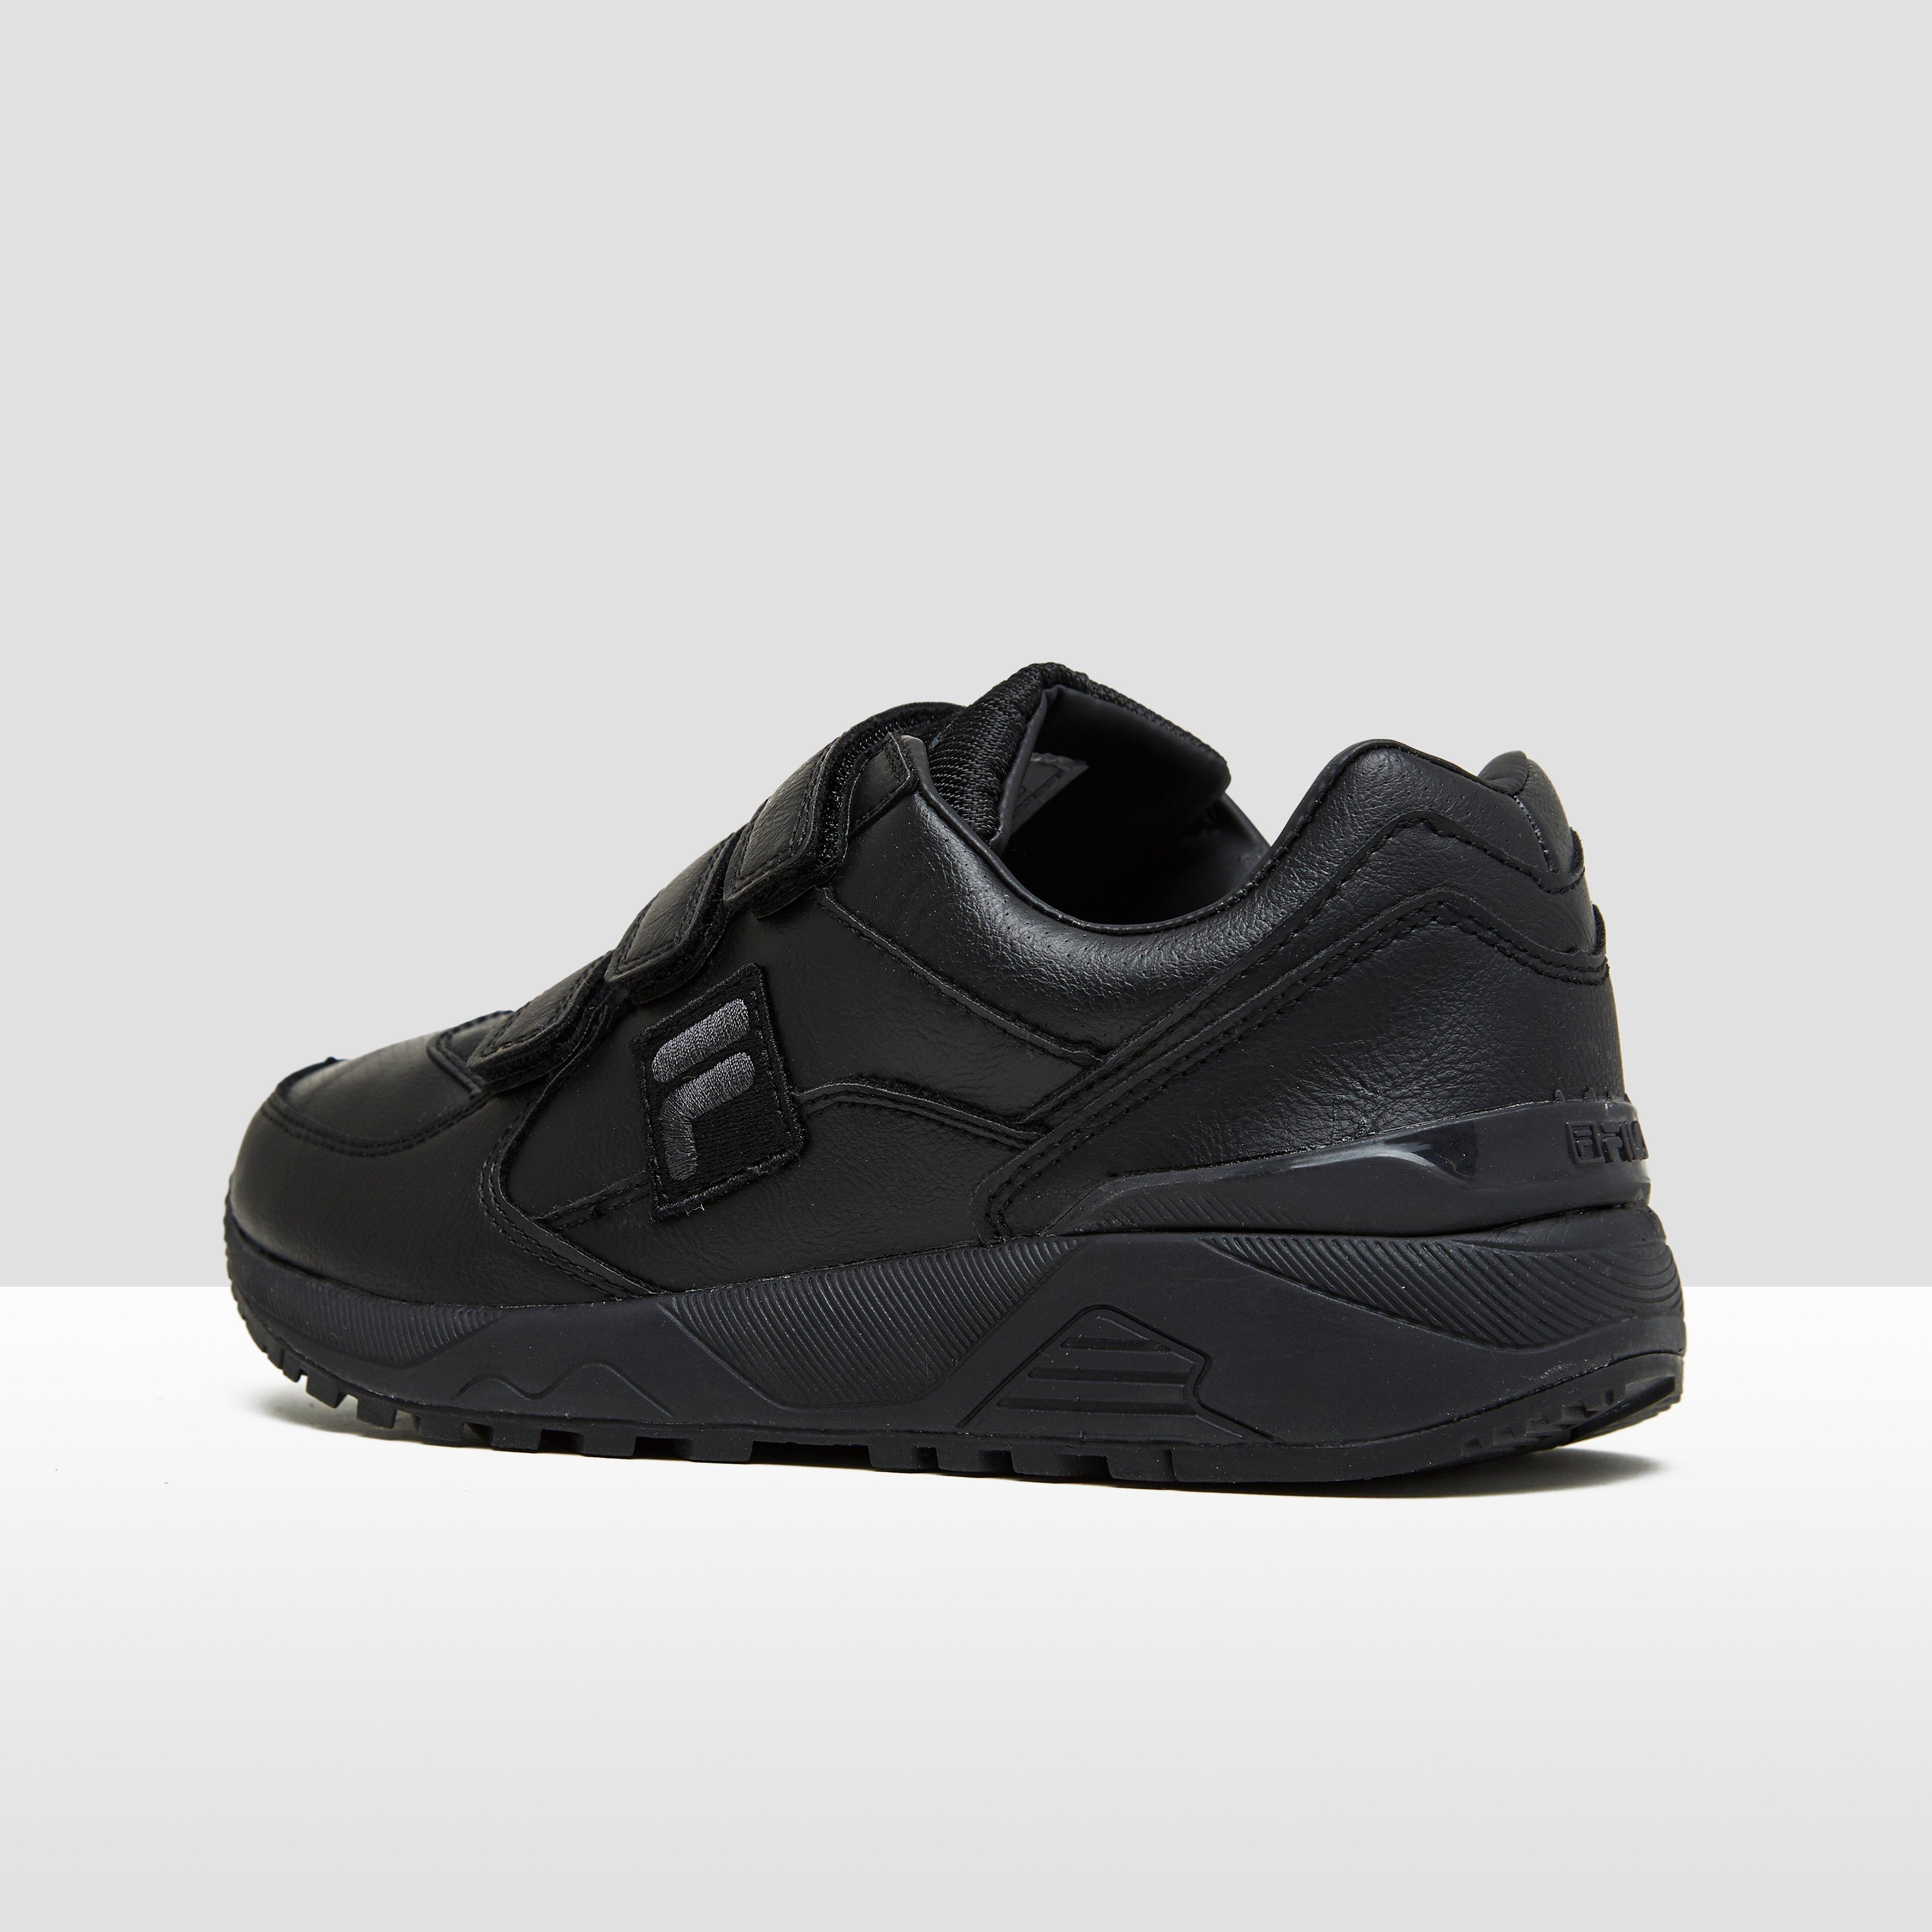 Noir 47 Hommes Chaussures Fila NK5kS7kY